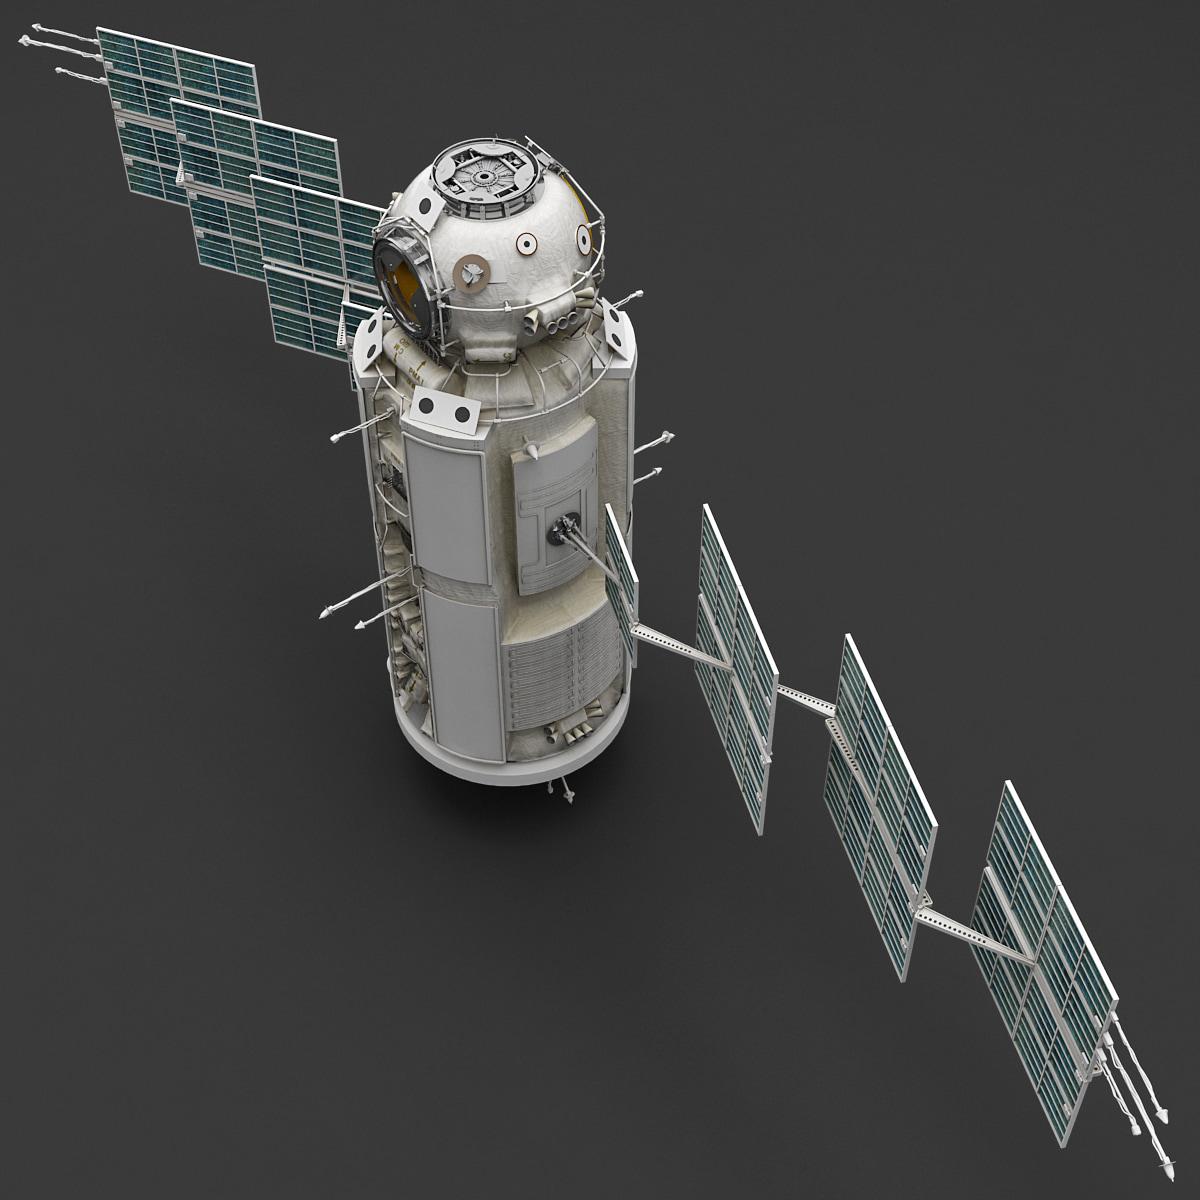 Space_Functional_Cargo_Block_Zarya_Rigged_0001.jpg